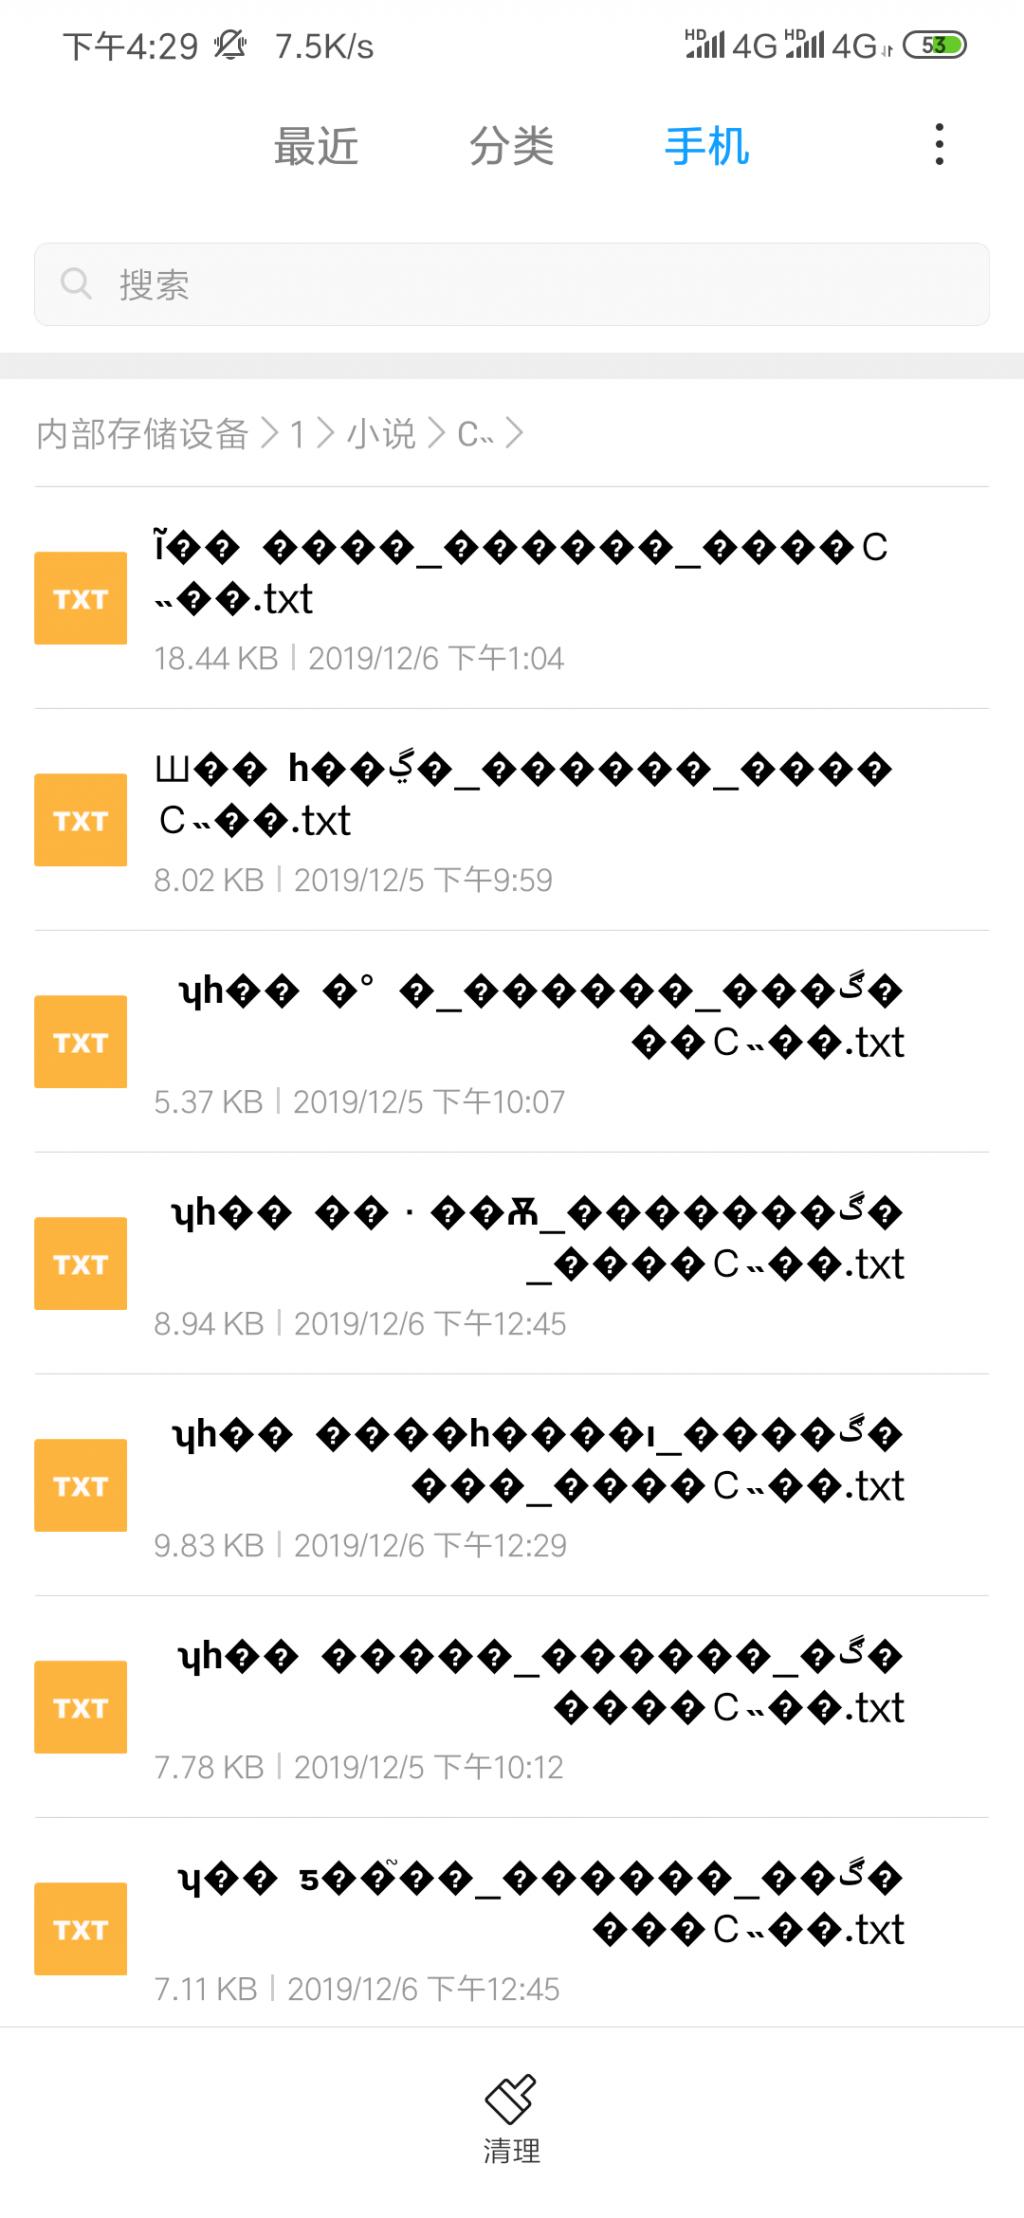 Screenshot_2019-12-06-16-29-29-686_com.android.fi.png